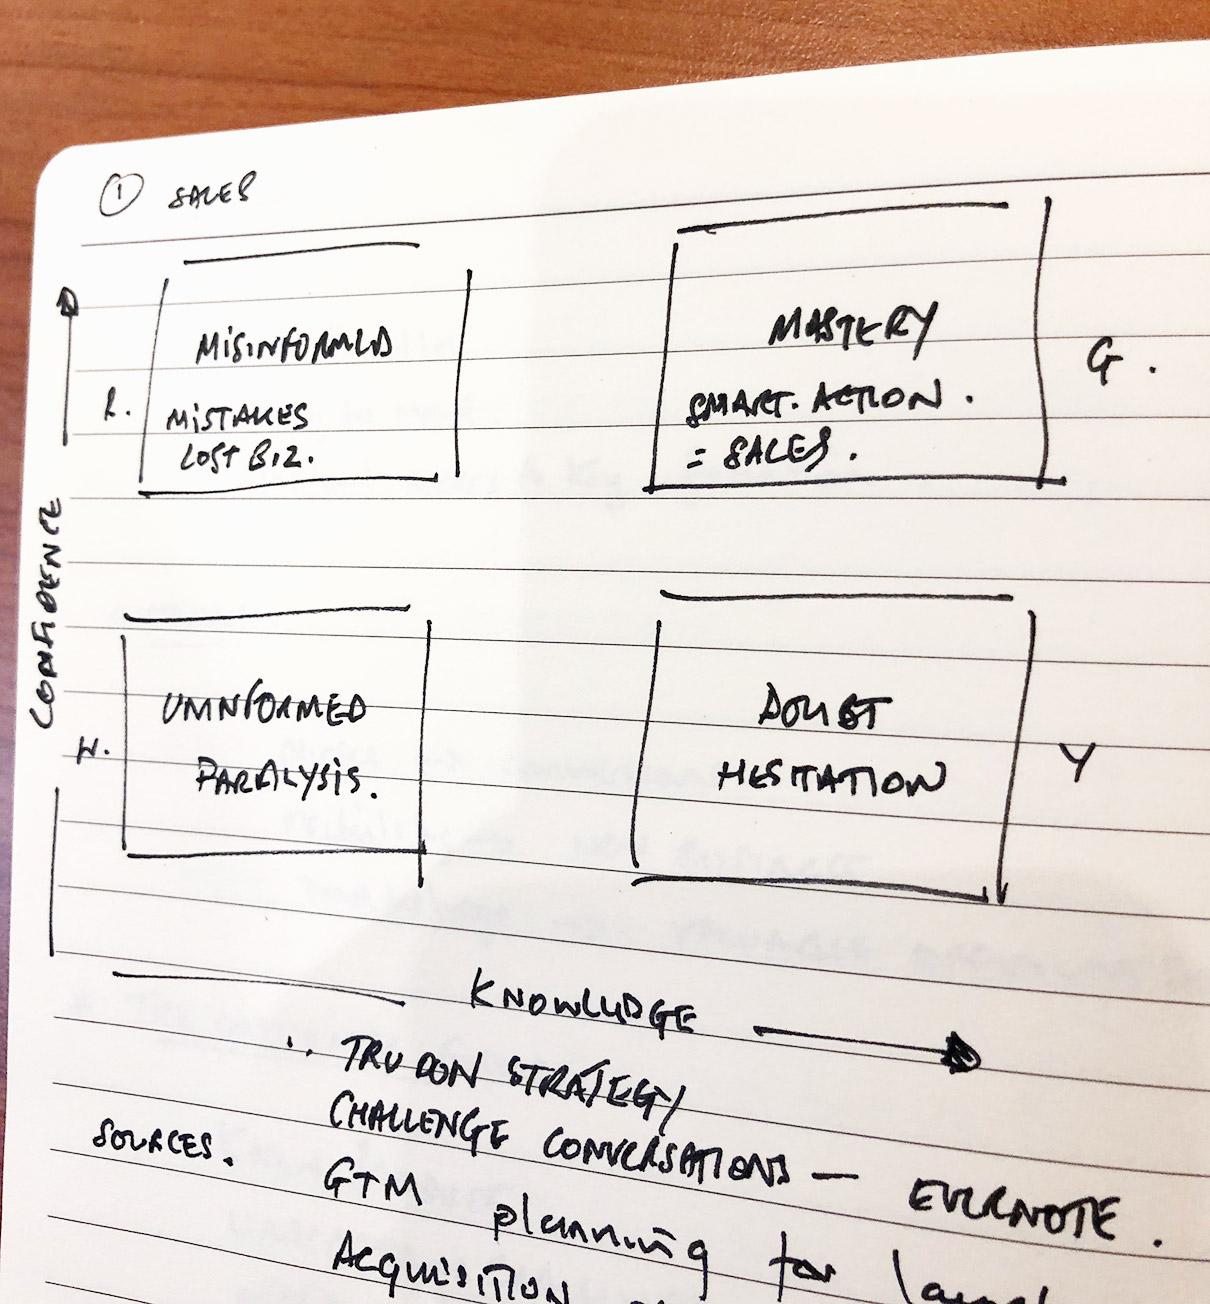 4 Quadrants of sales confidence with digital media